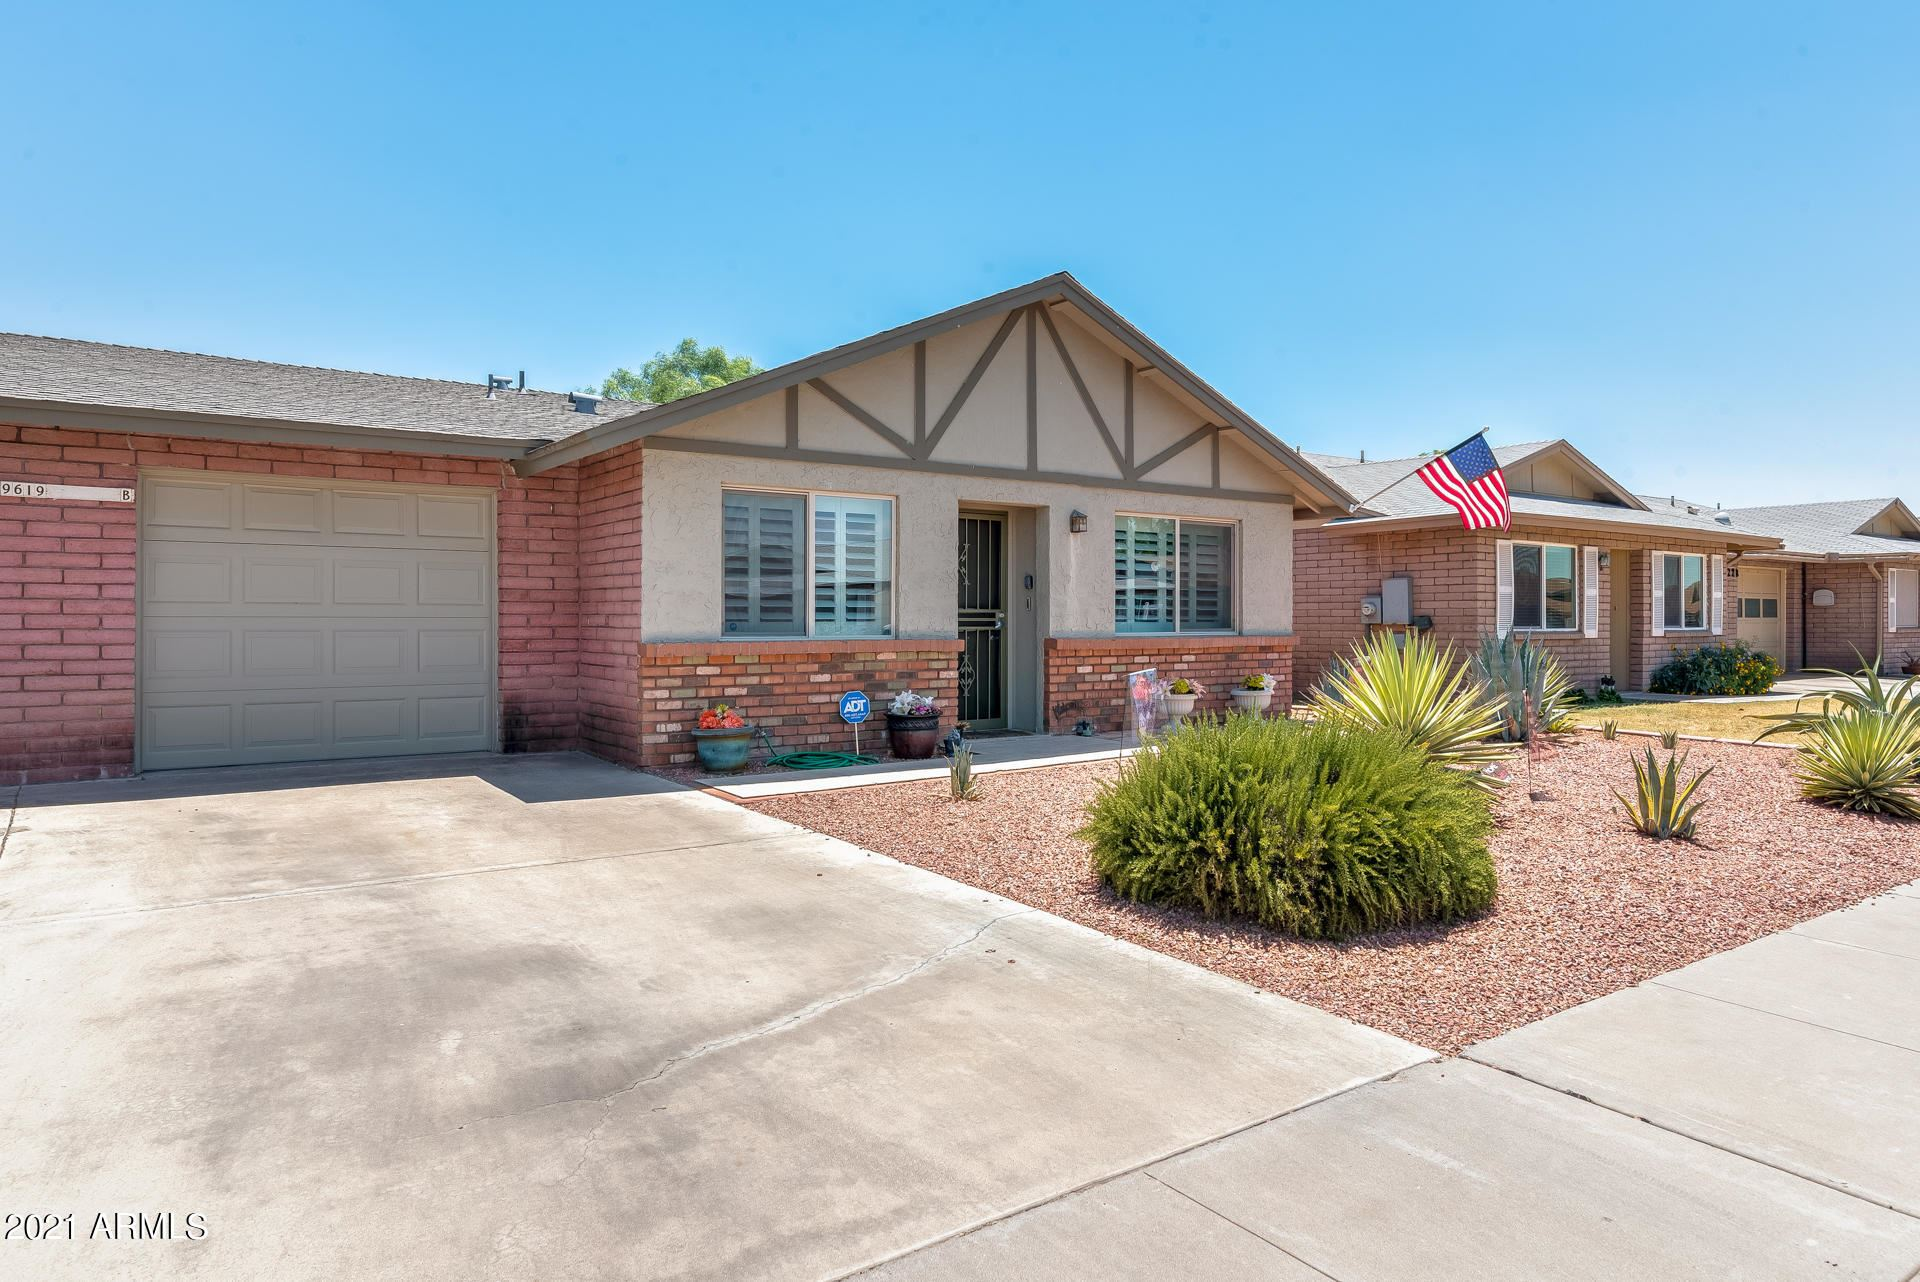 9619 W IRONWOOD Drive #B, Peoria, AZ 85345 - MLS#: 6258380